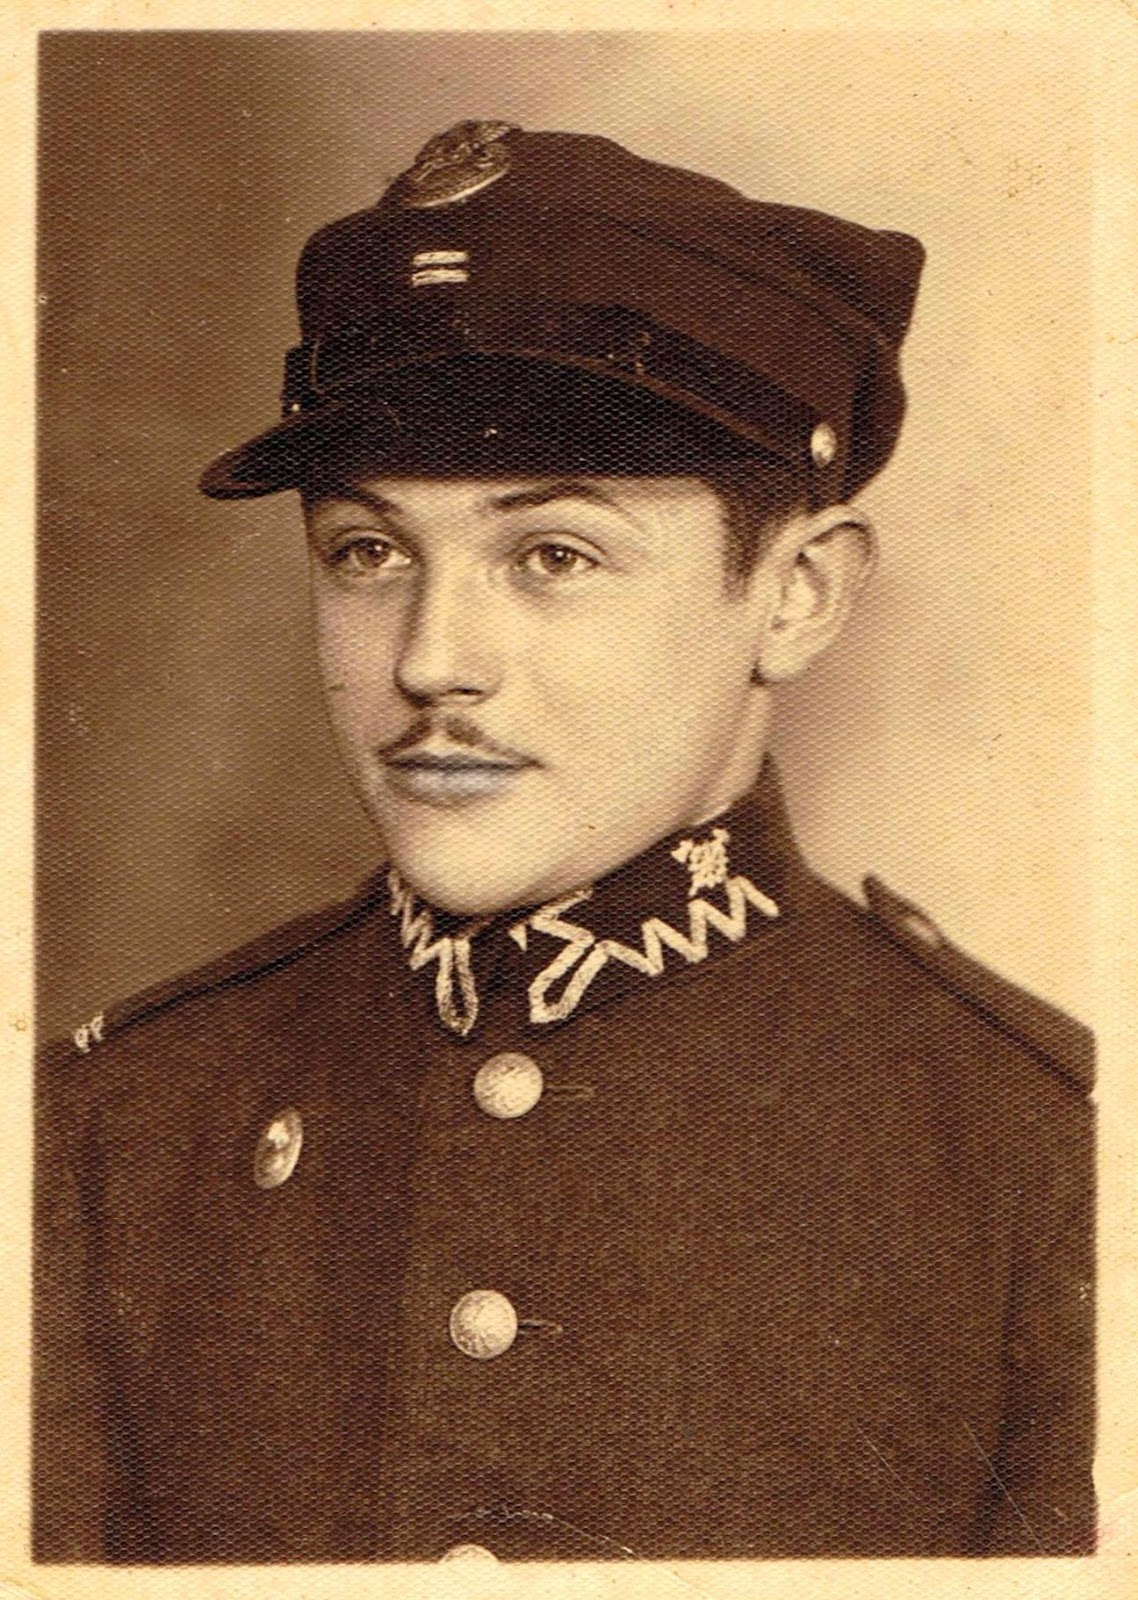 Corporal Boleslaw Obst, 1939. Photoprovided by Dawid Kufel